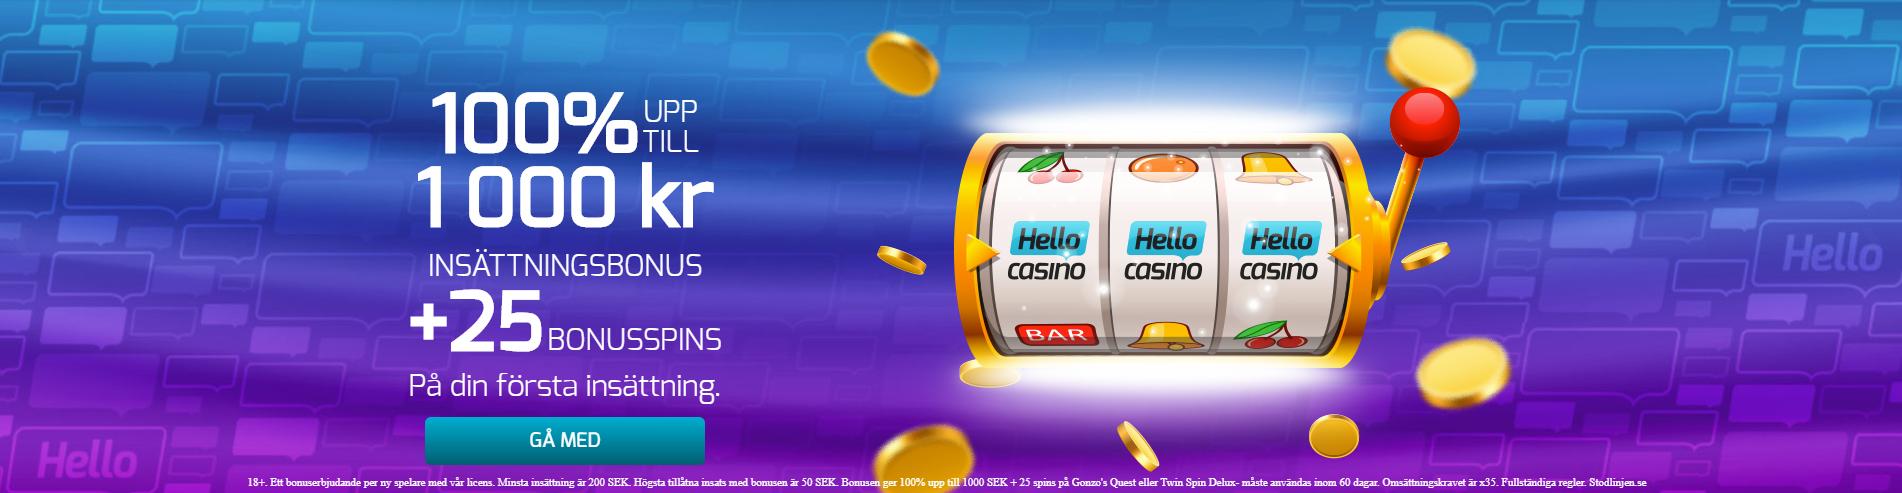 Hello Casino Content Images - Sweden CasinoTop 01